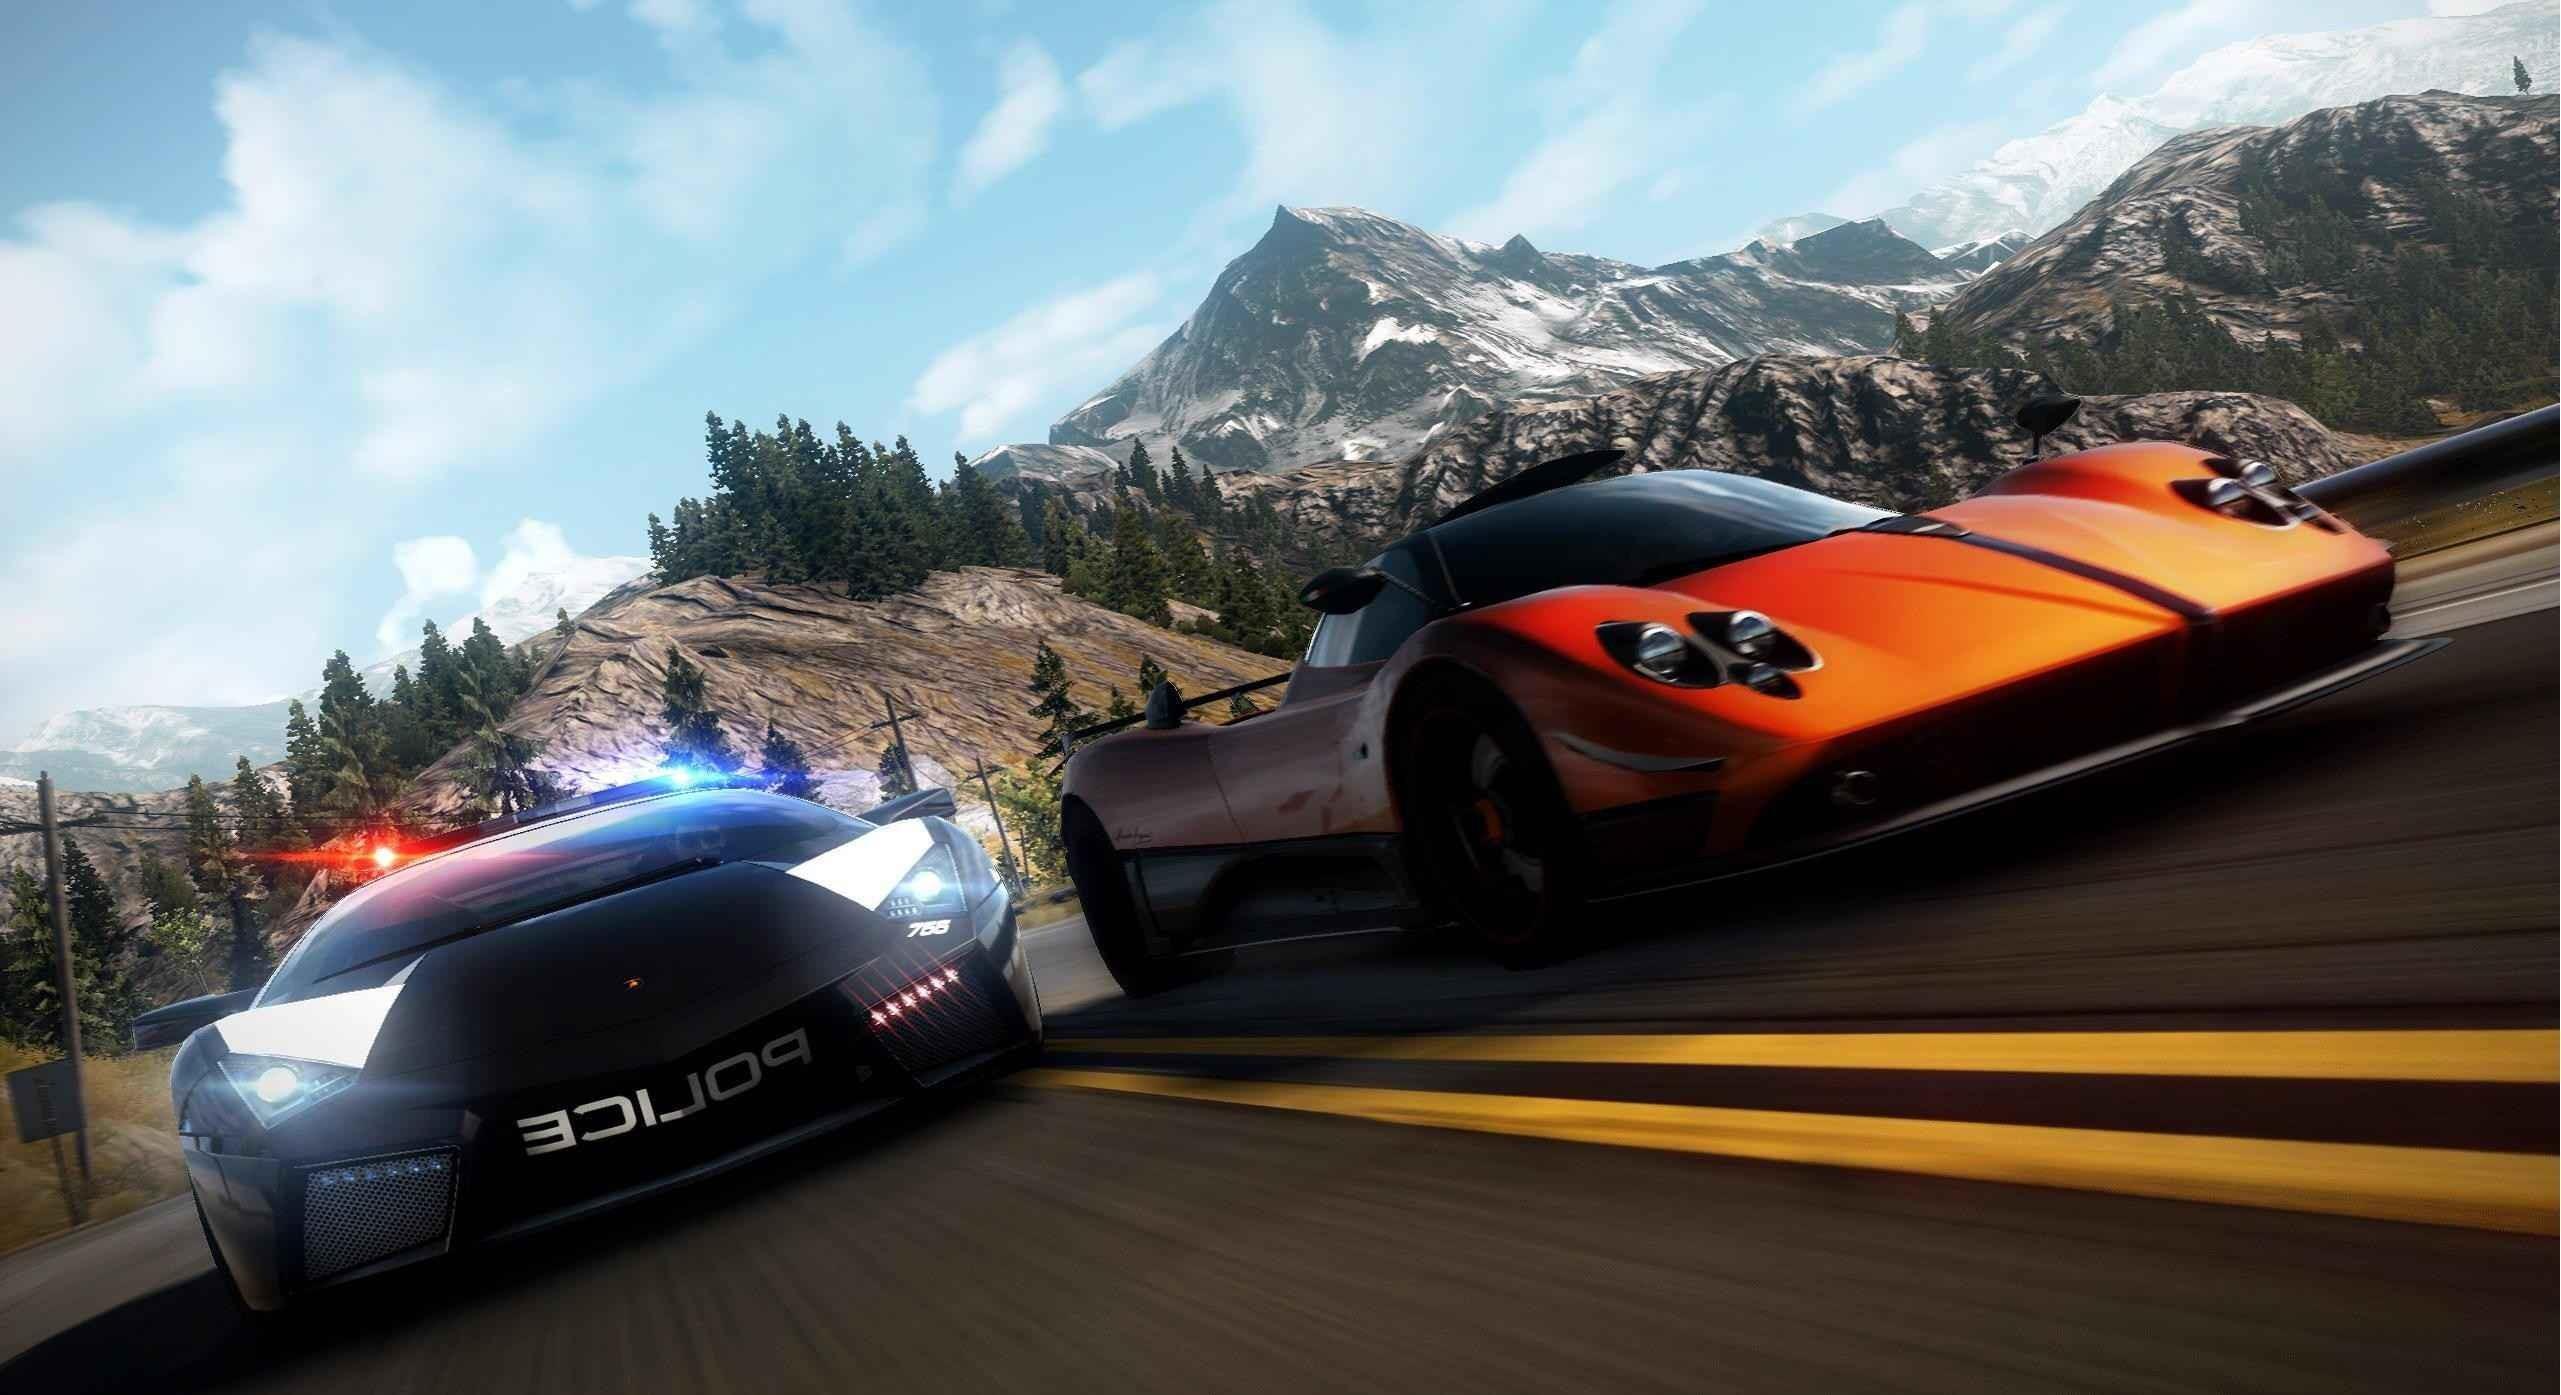 Fond D Ecran Jeux Video Vehicule Need For Speed